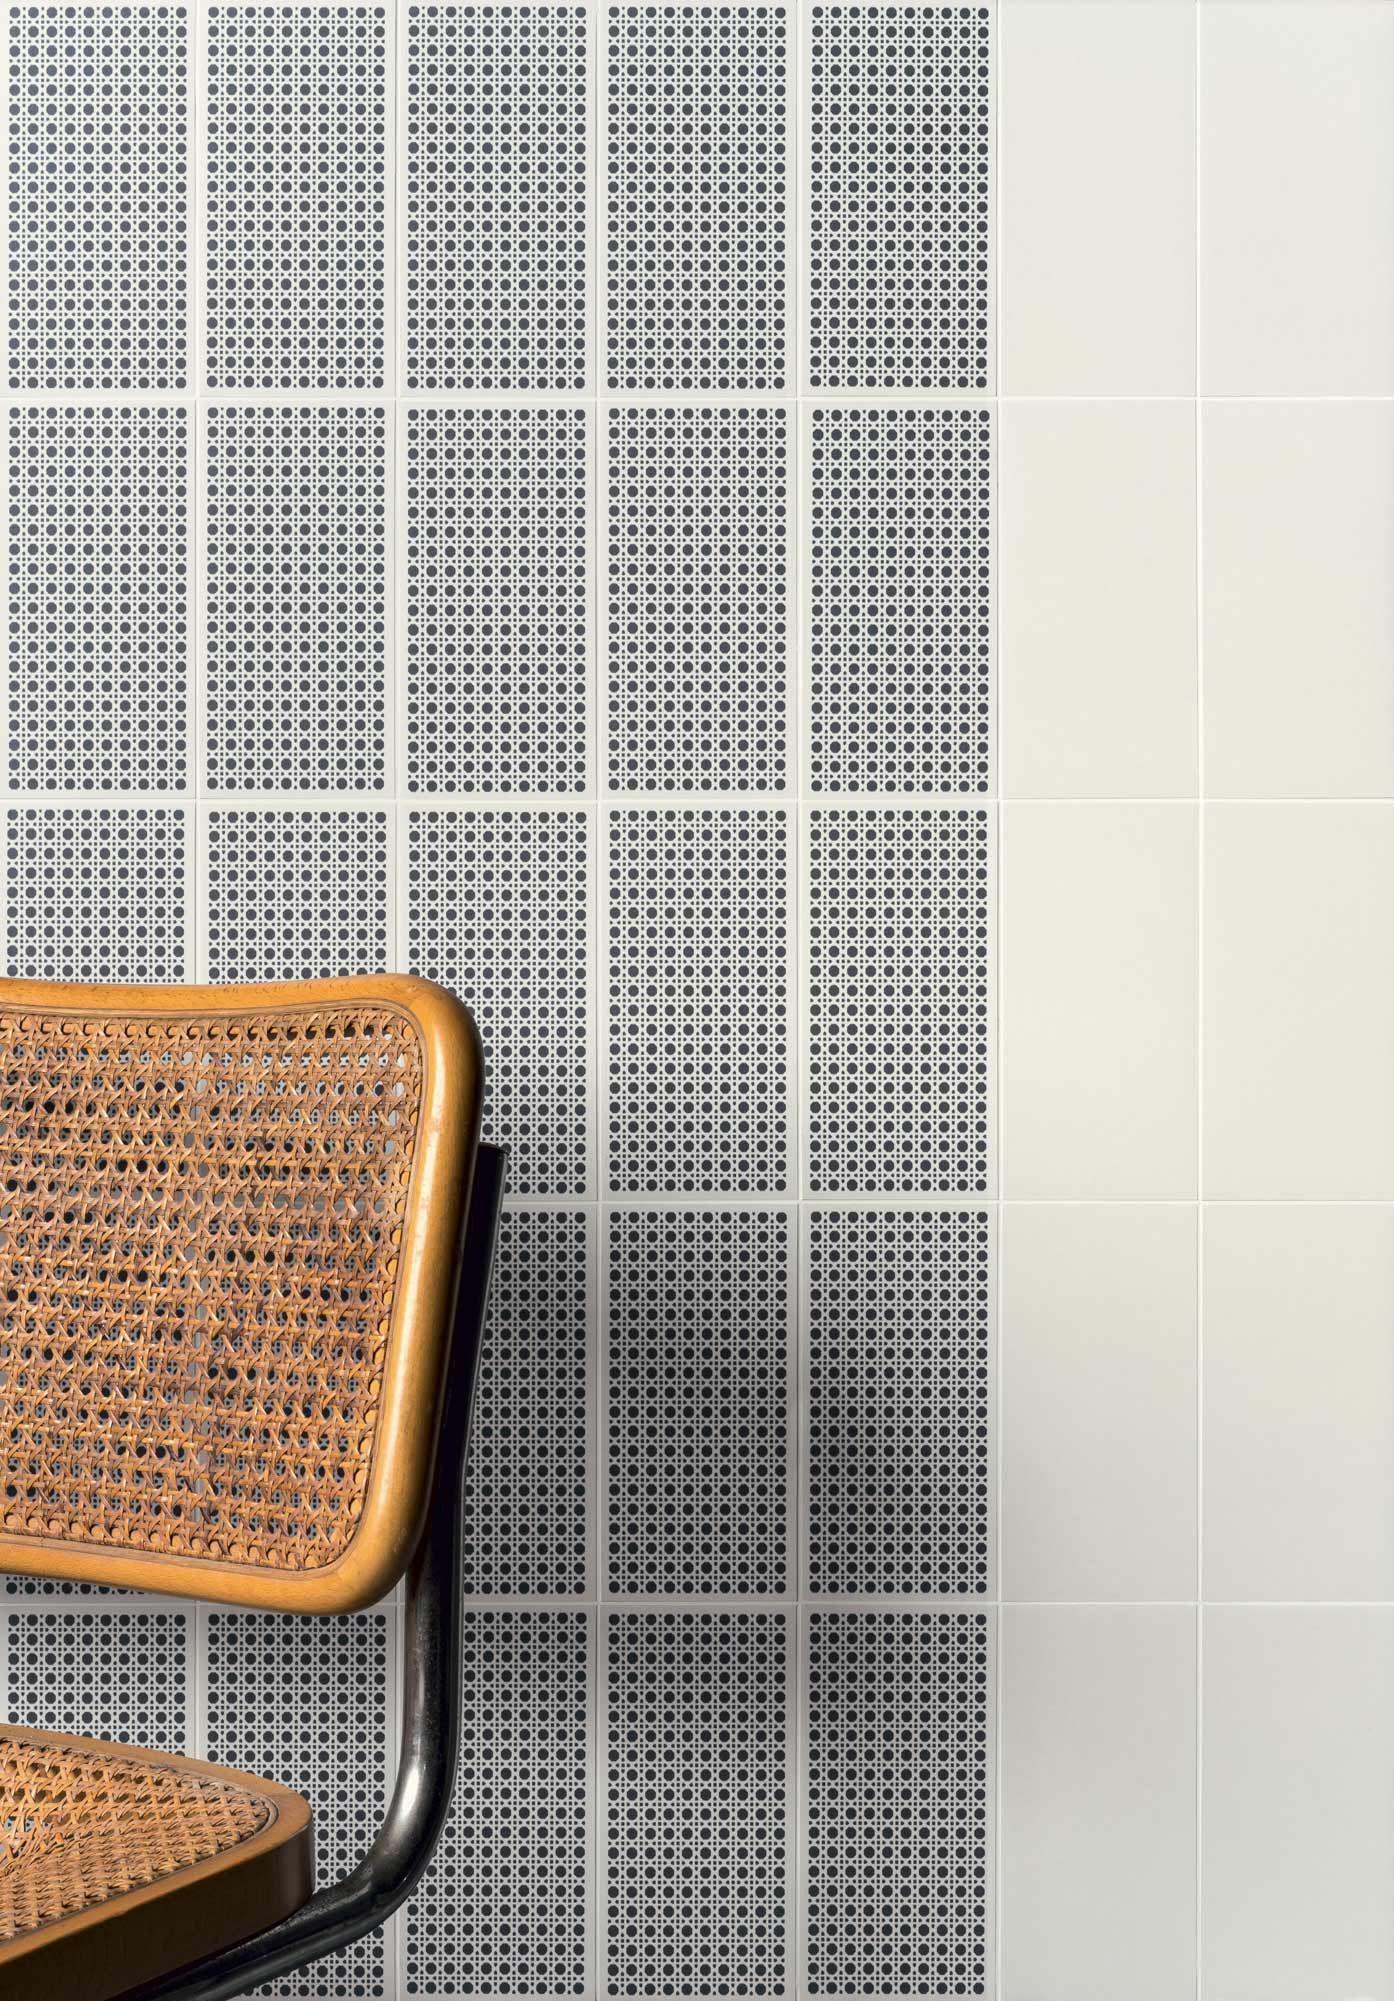 Credence En Gres Cerame sunday   41zero42   credence salle de bain, revetement mur